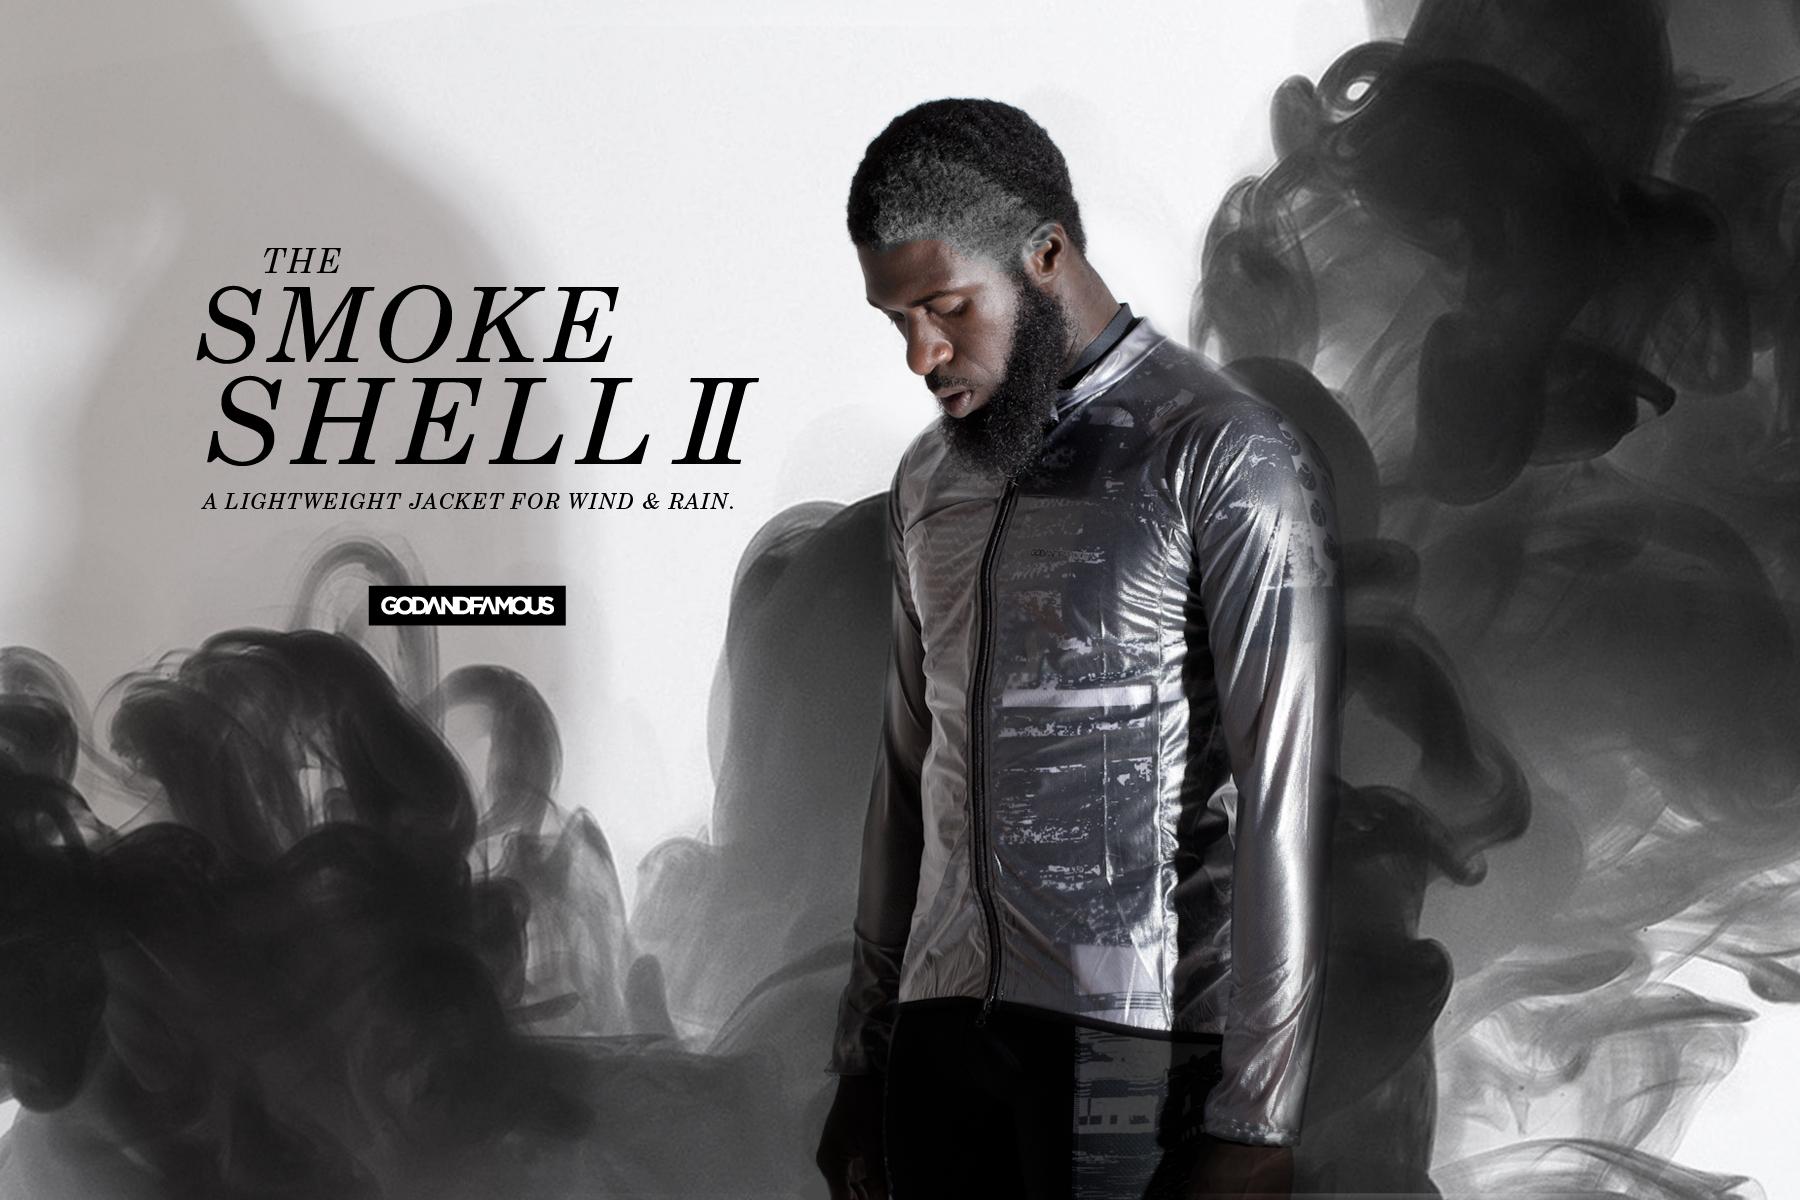 godandfamous_smokeshell2_promo_1.jpg